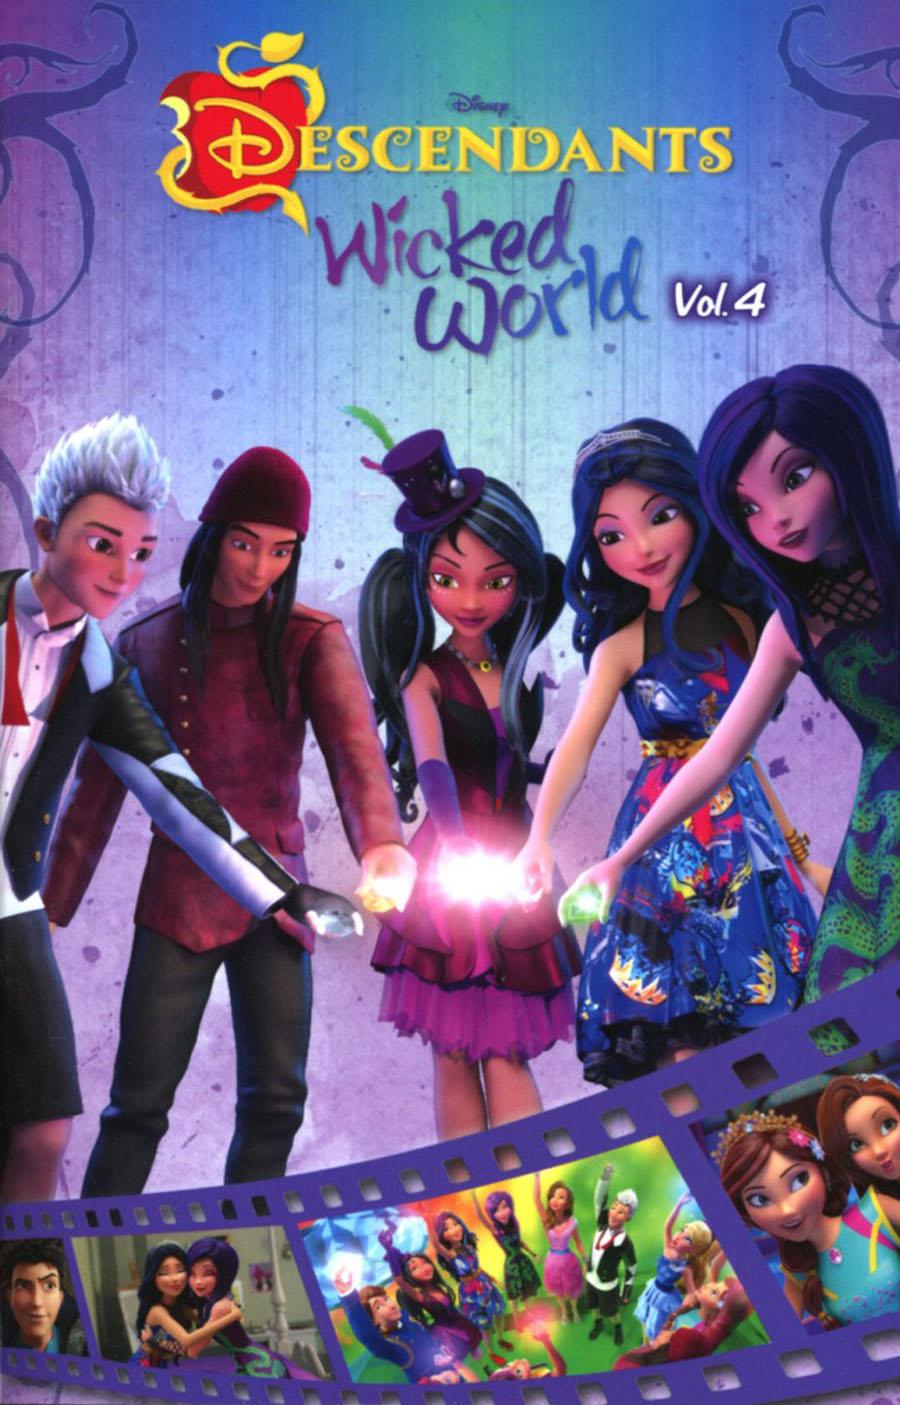 Disneys Descendants Wicked World Cinestory Vol 4 TP